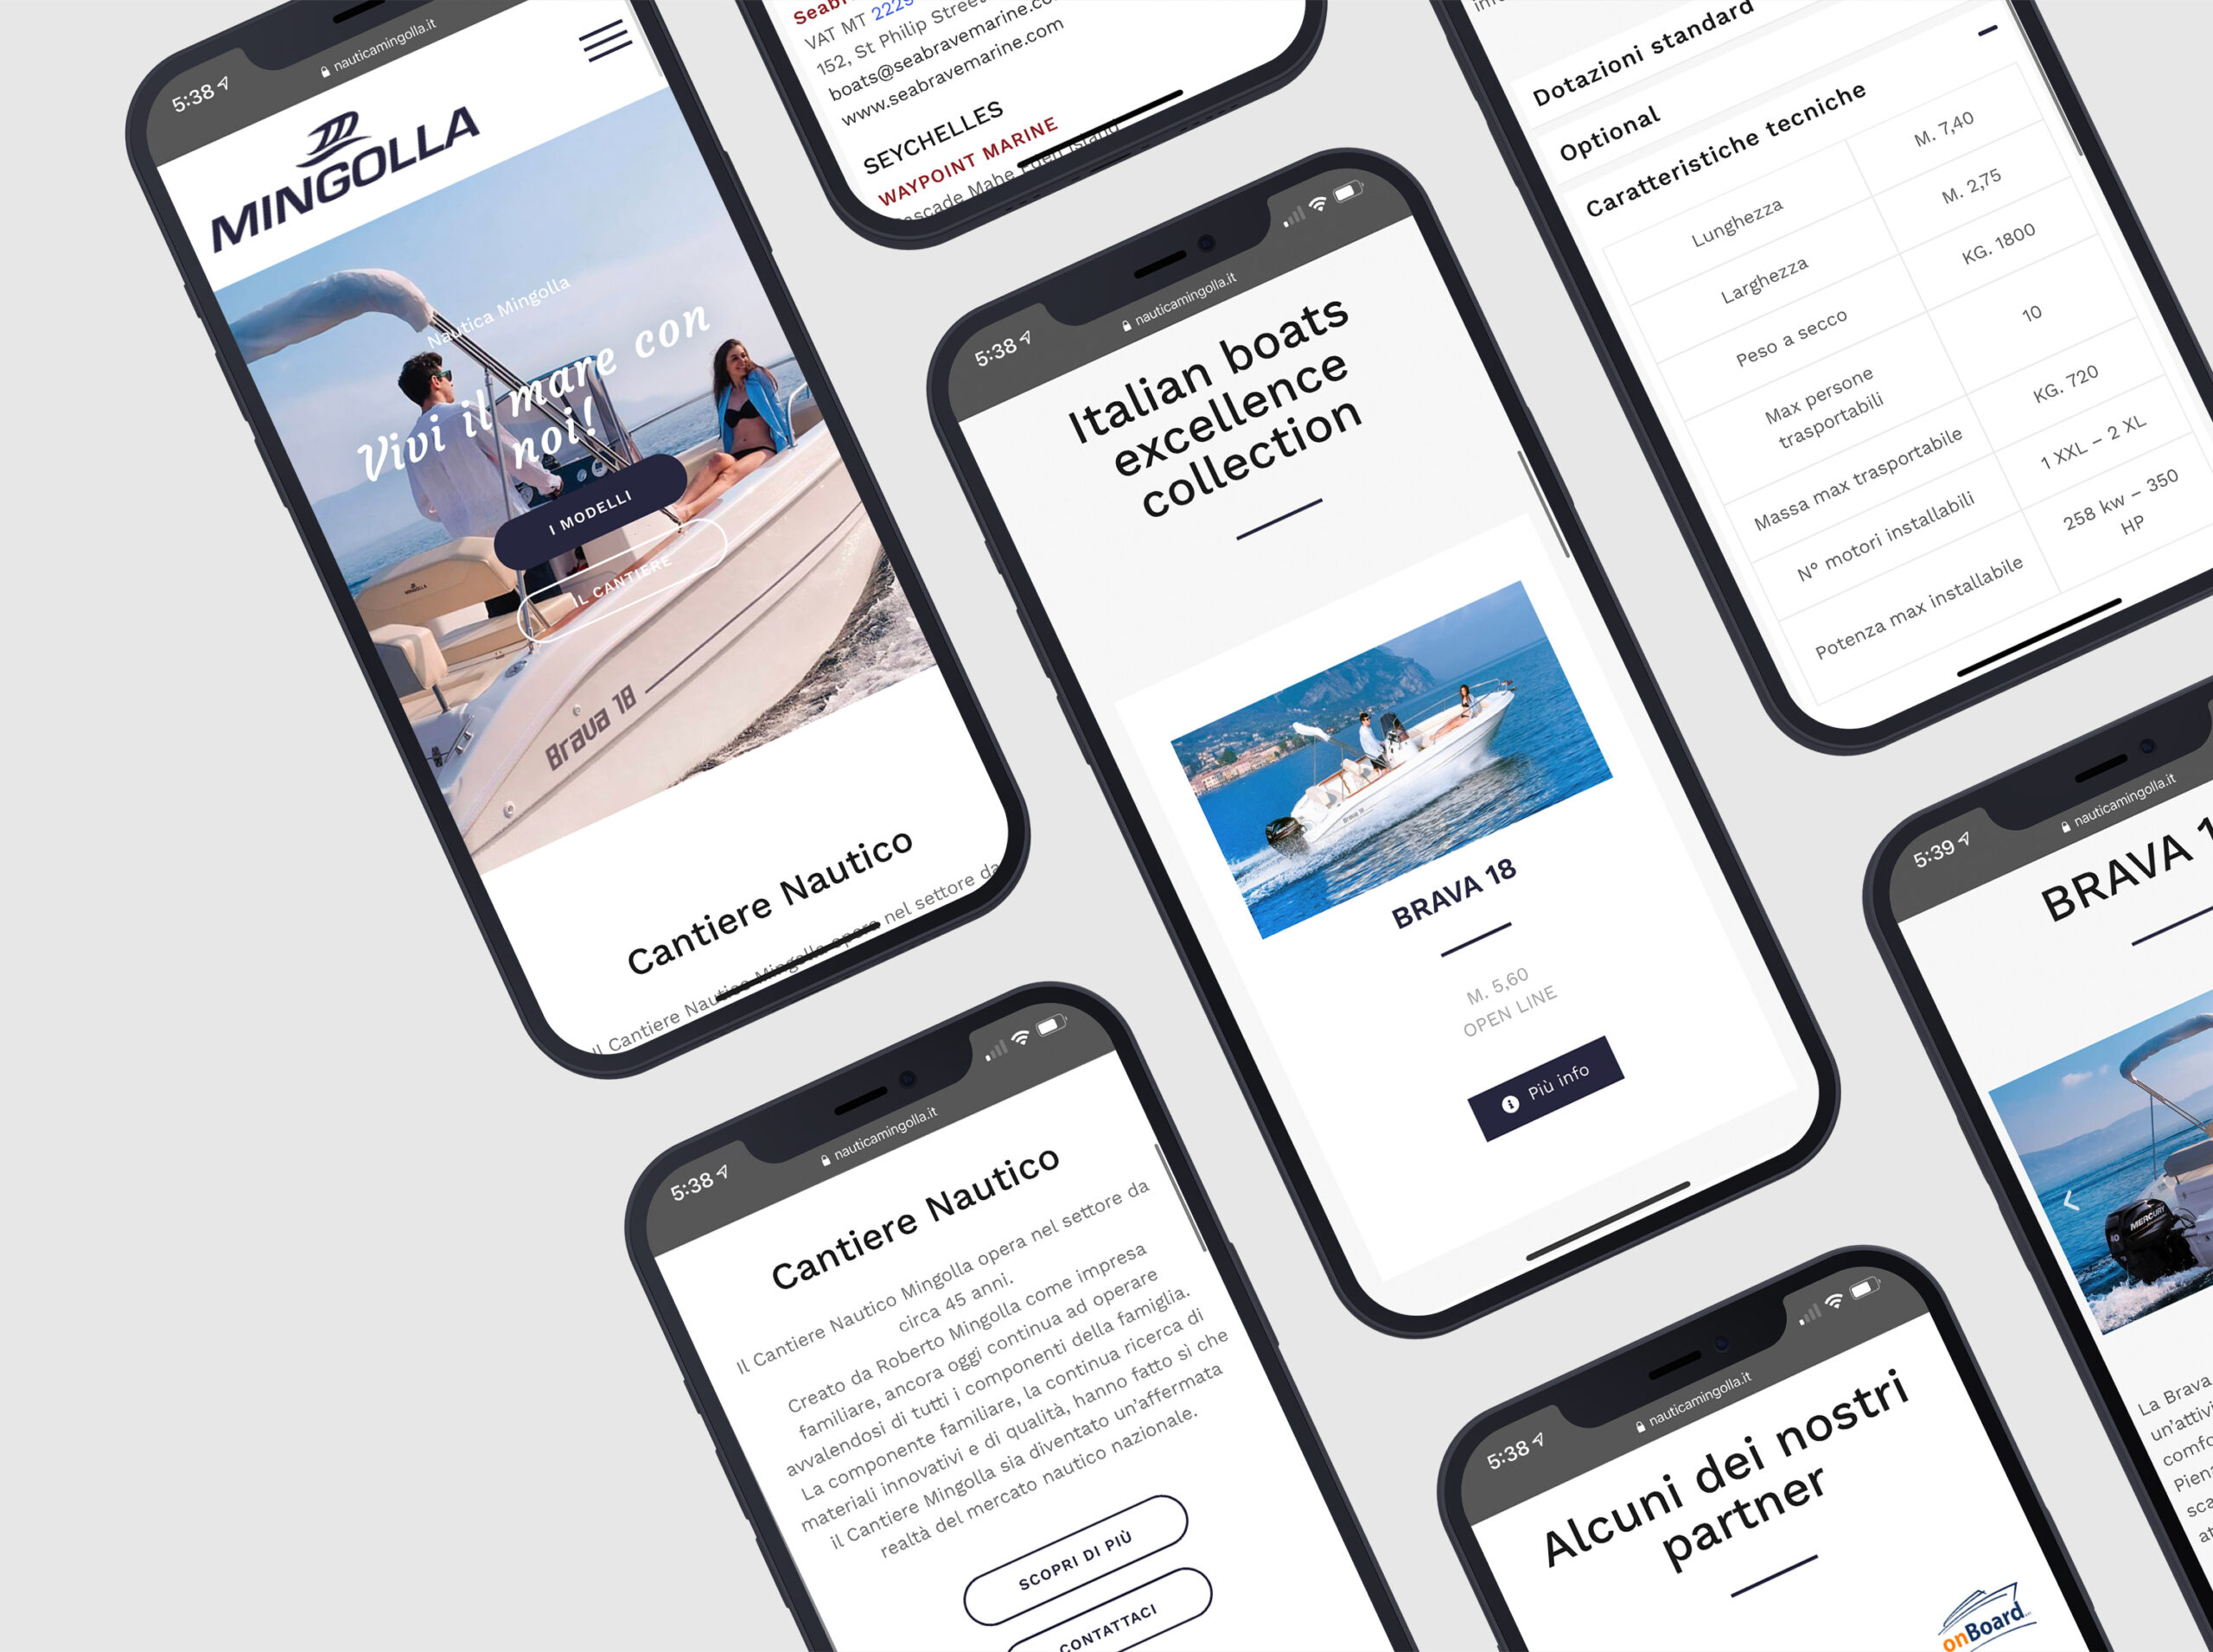 Nautica Mingolla - digital, web, print - img 3